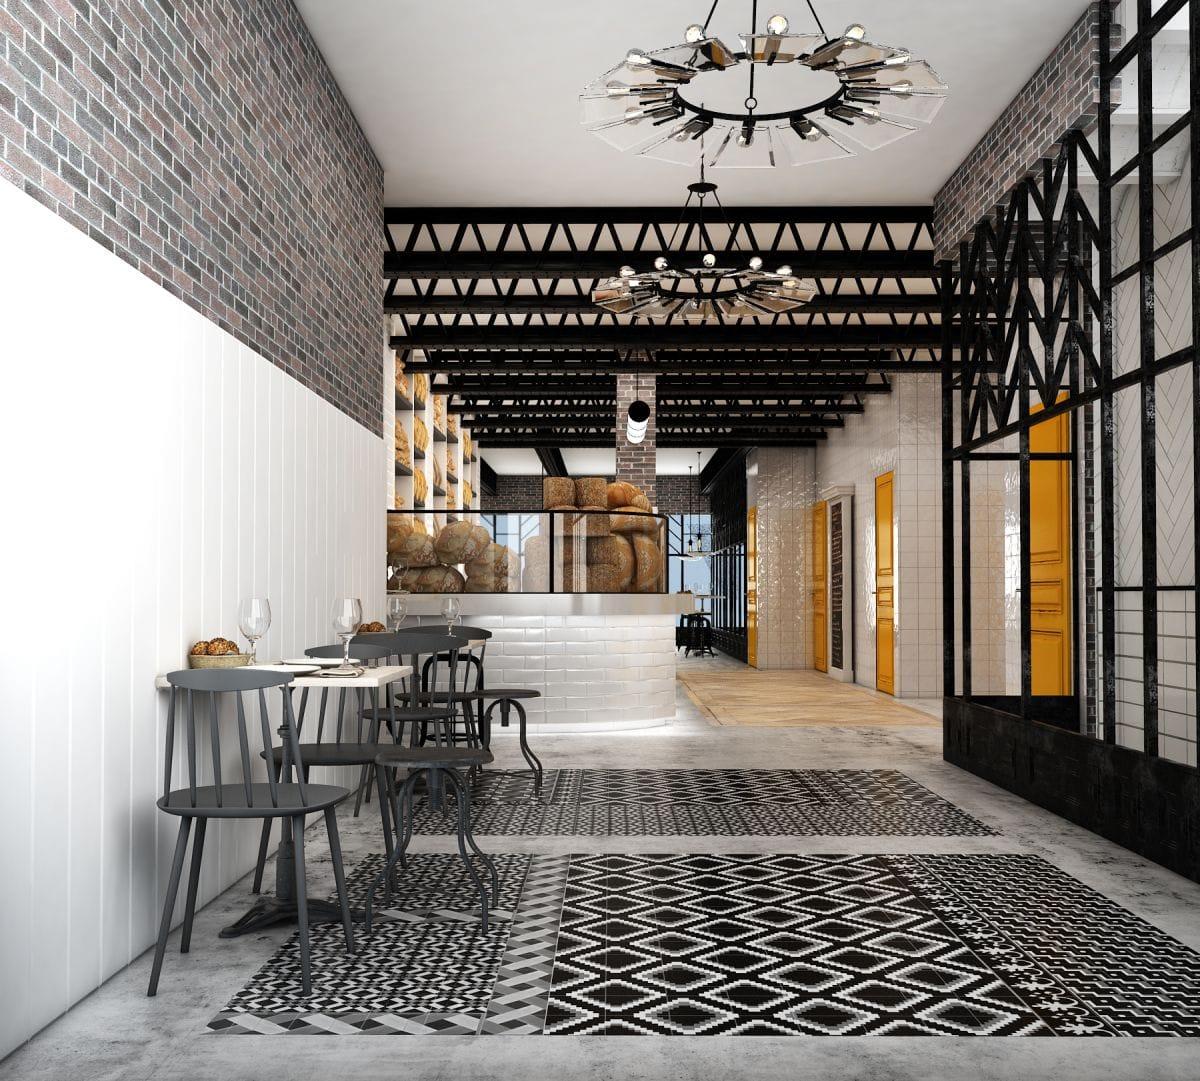 Inside Look: Hotel Praktik Bakery, Barcelona